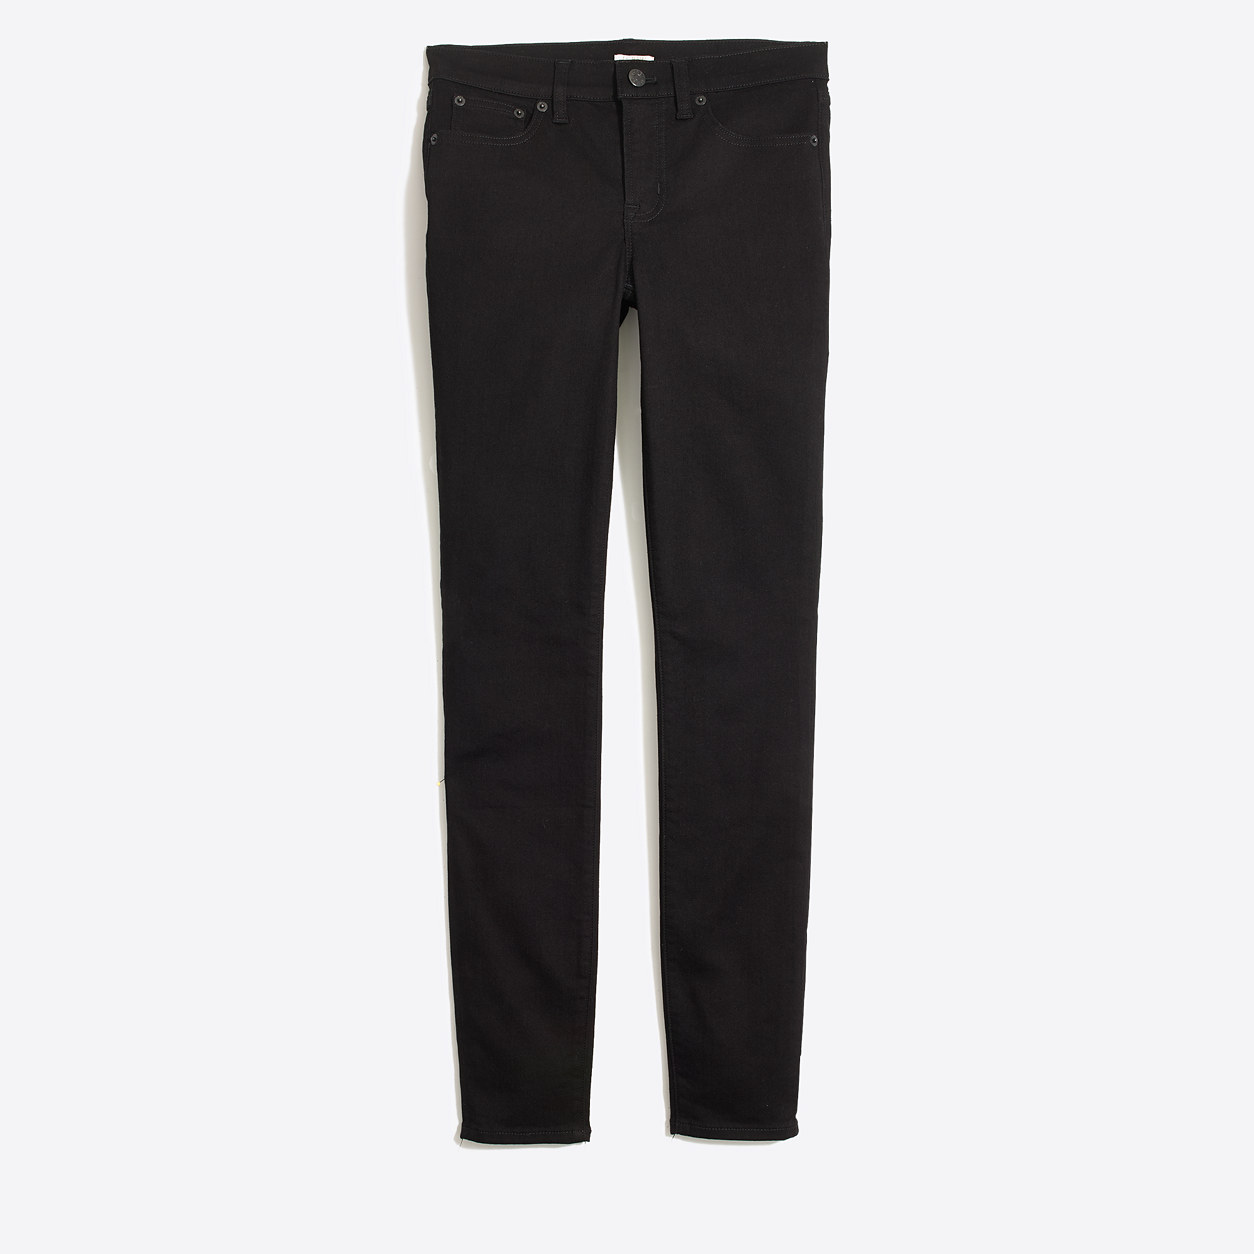 Skinny ankle jean : denim | J.Crew Factory